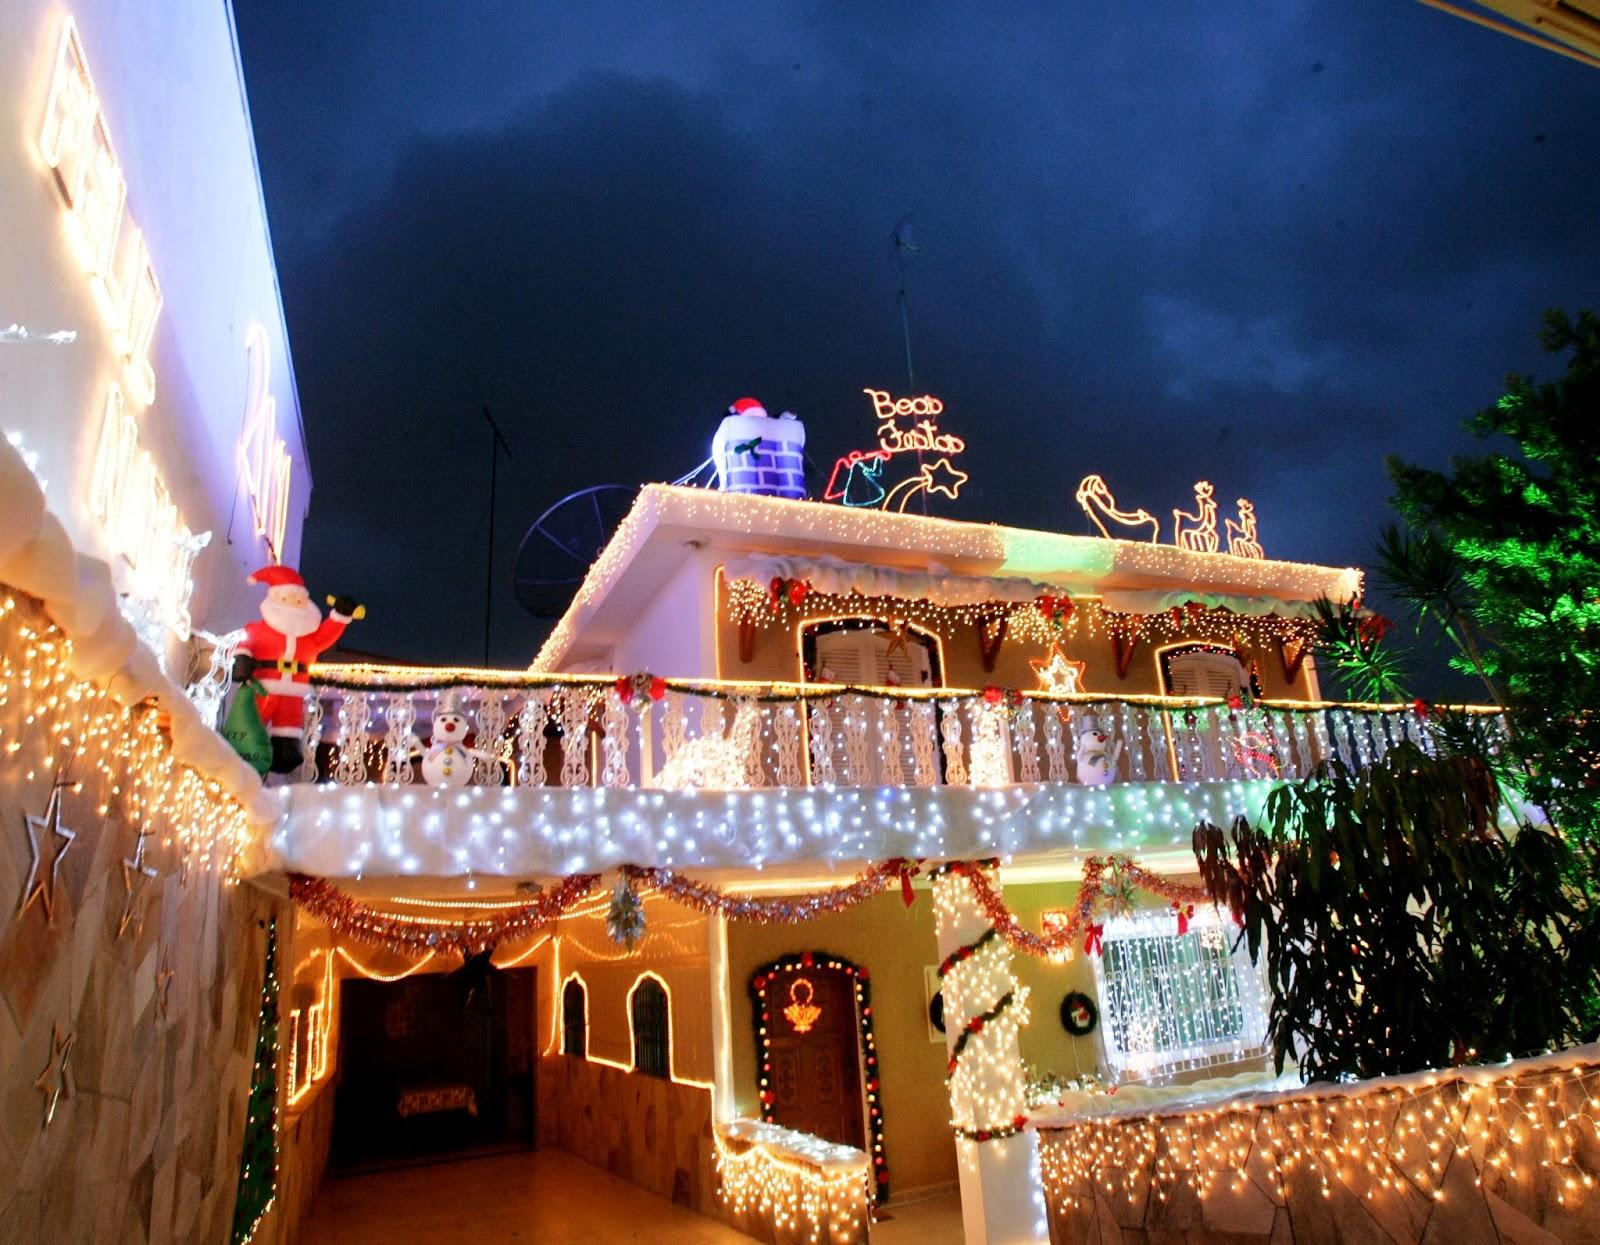 decoracao de natal para interiores de casas:Fachadas de casas/lojas decoradas para o natal – veja modelos e dicas